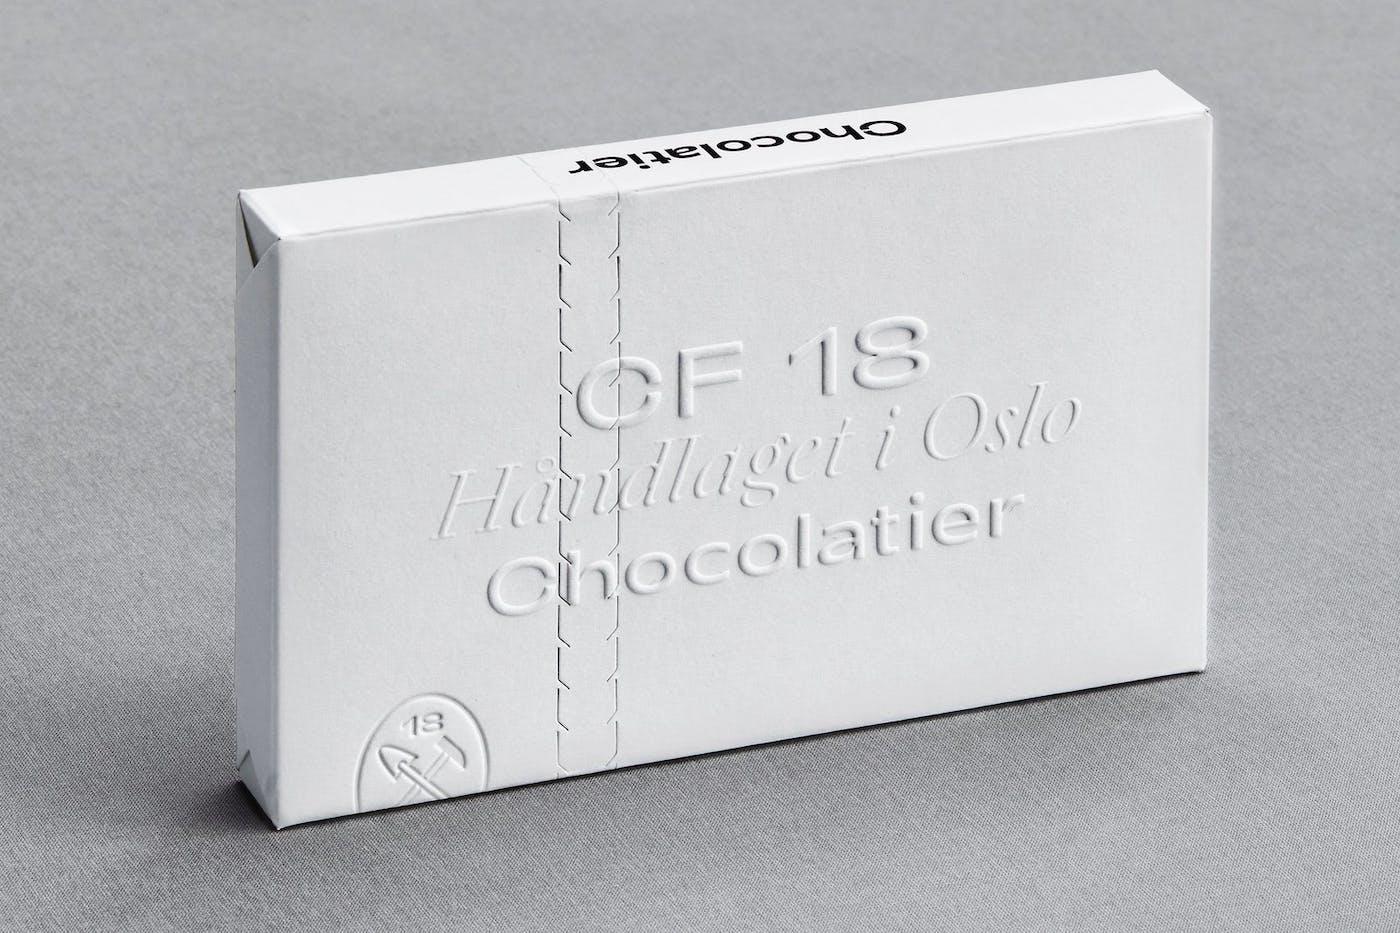 CF18 Chocolatier Olssøn Barbieri 1